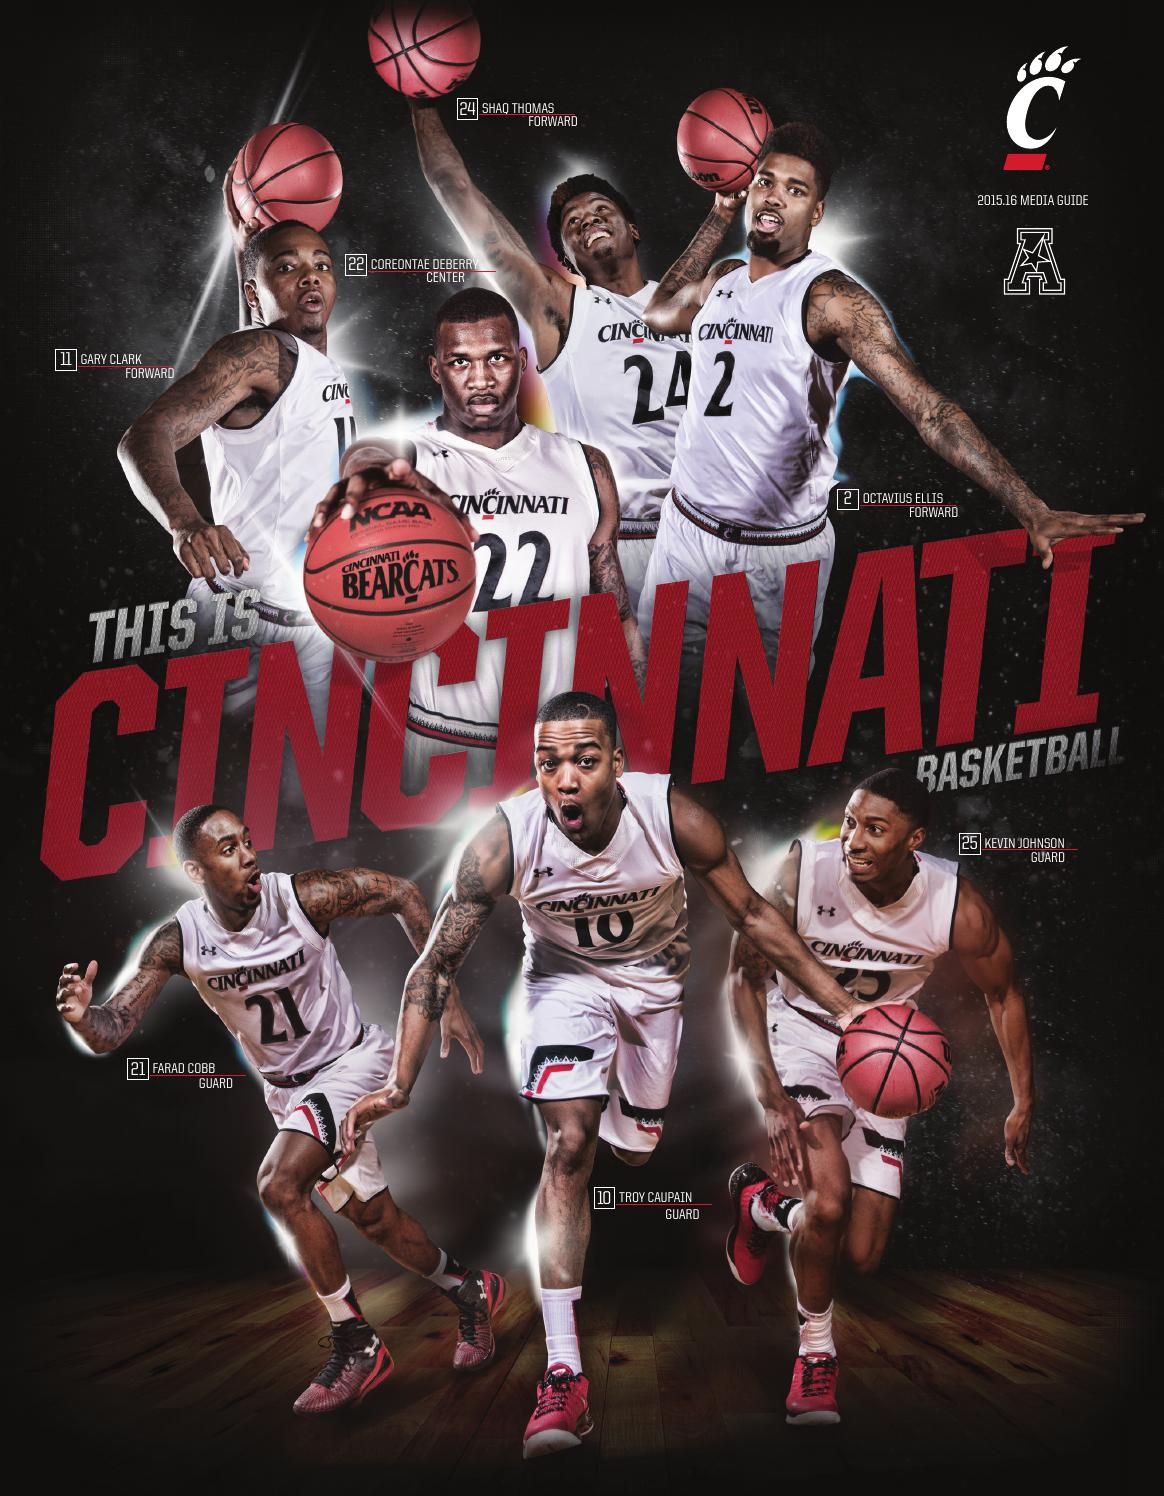 f3e57a299 2015 16 Cincinnati Men s Basketball Media Guide by UCBearcats - issuu